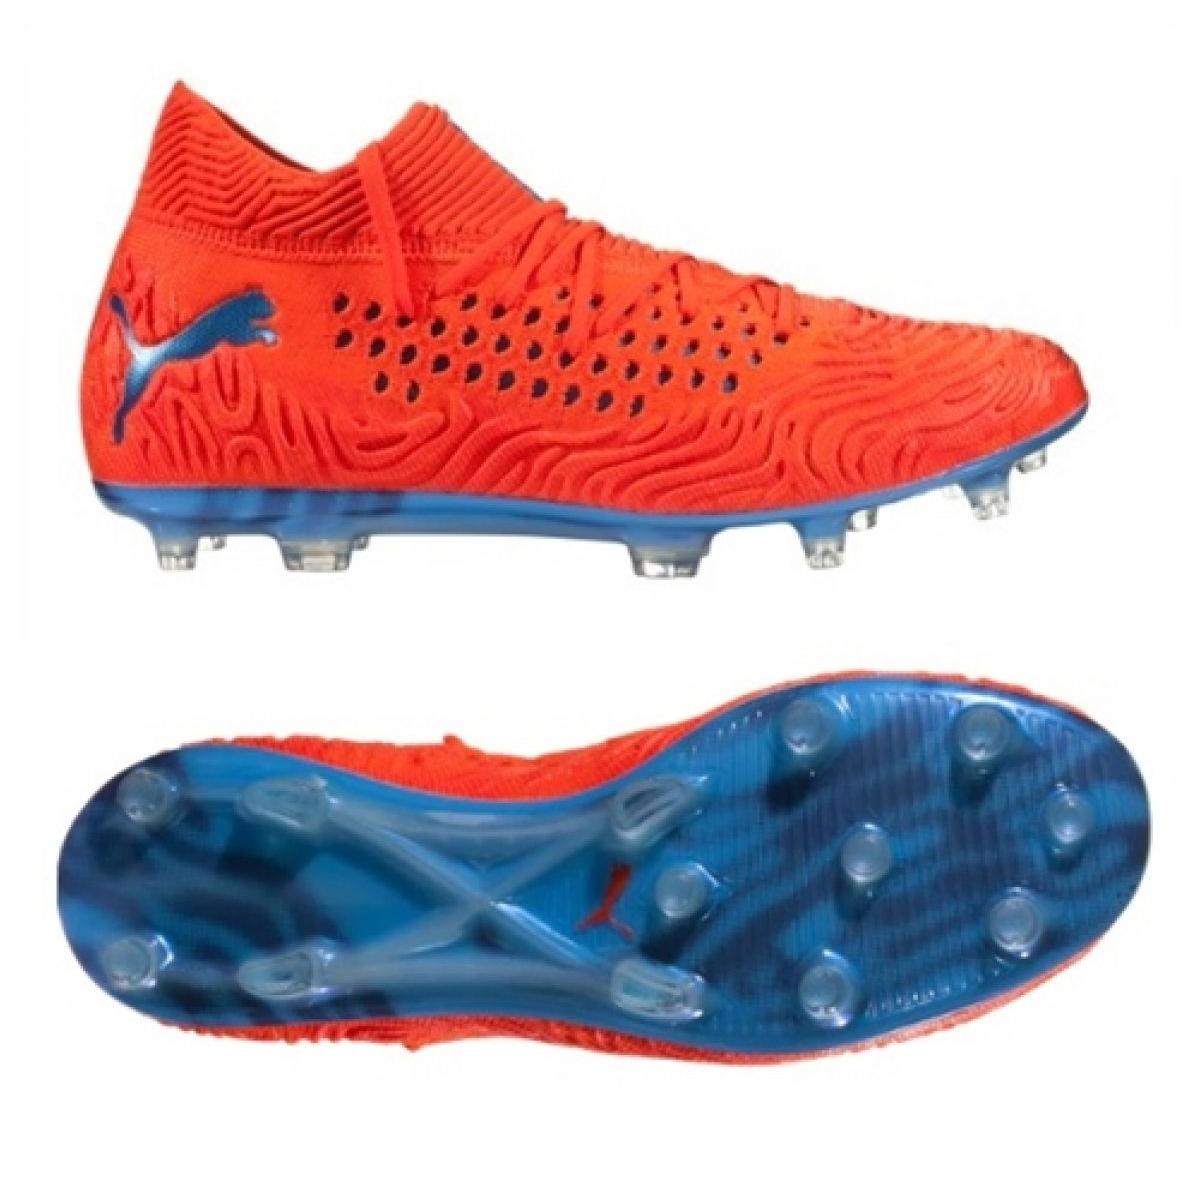 Chaussures Fg Ag 01 Football M 1 105531 De Future Puma 19 Netfit tCsQhrd